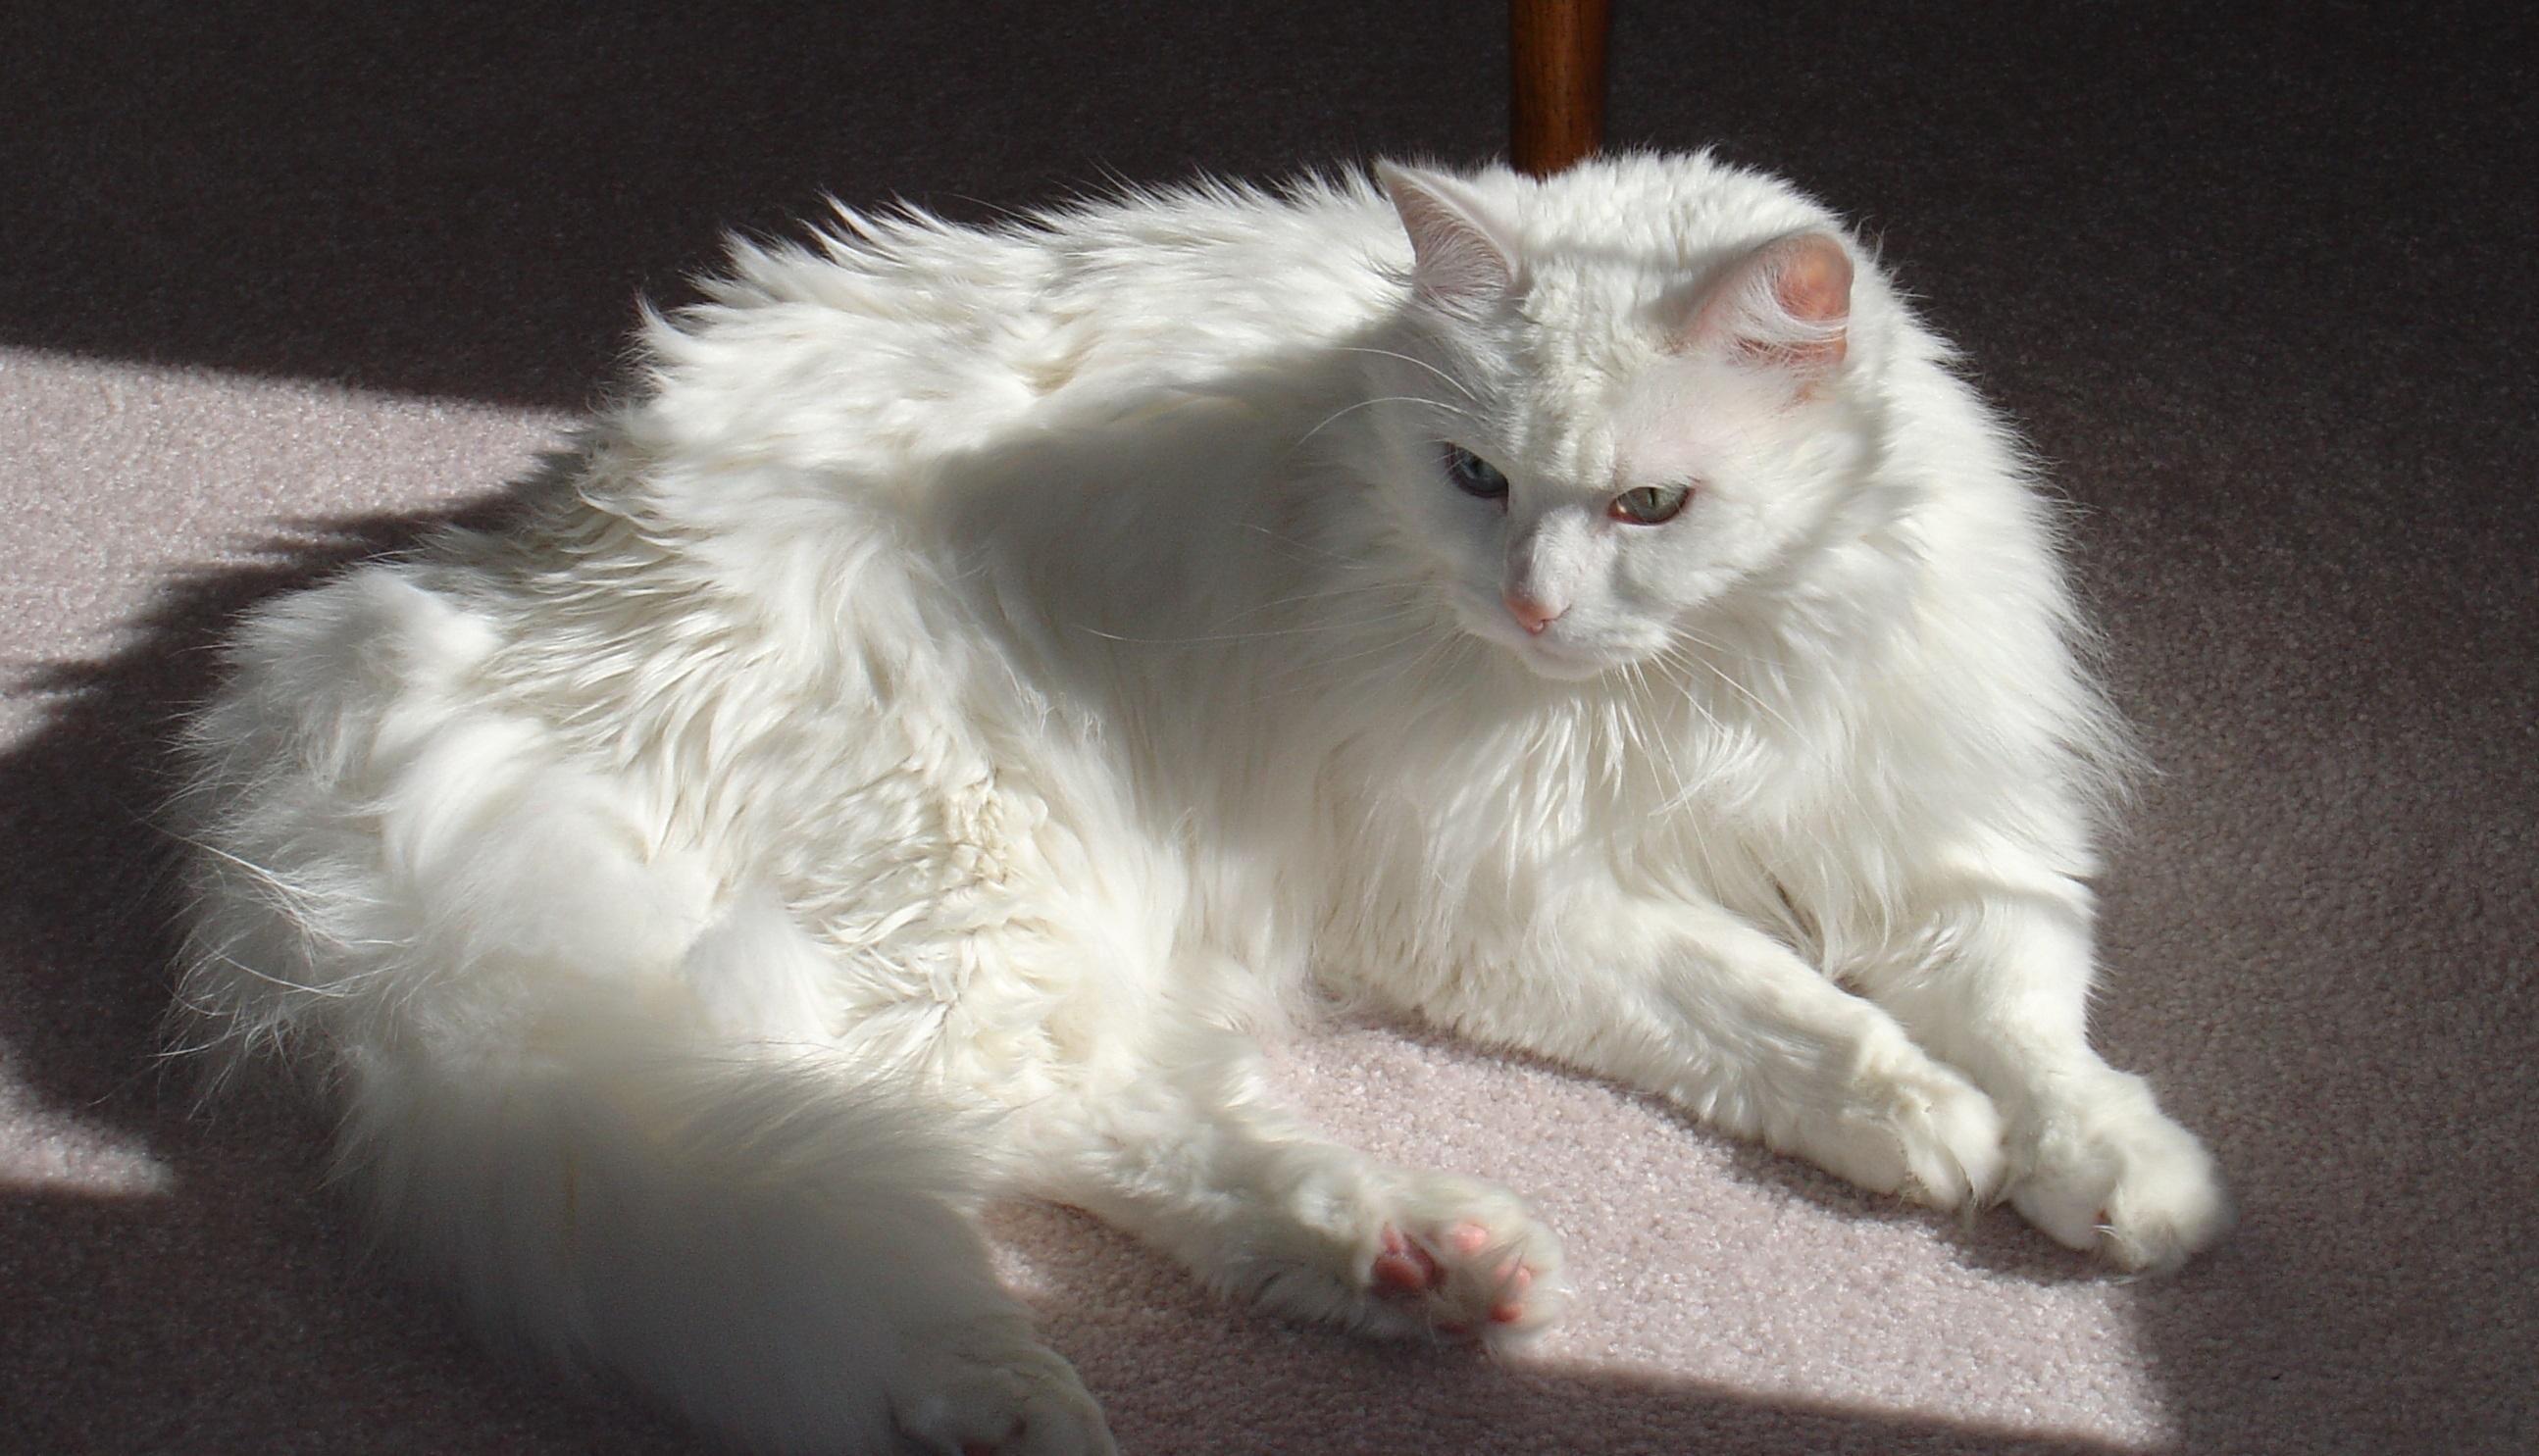 b4f689b92e white kitten cat mammal whiskers the vertebrate ragdoll reggi norwegian  forest cat turkish van small to